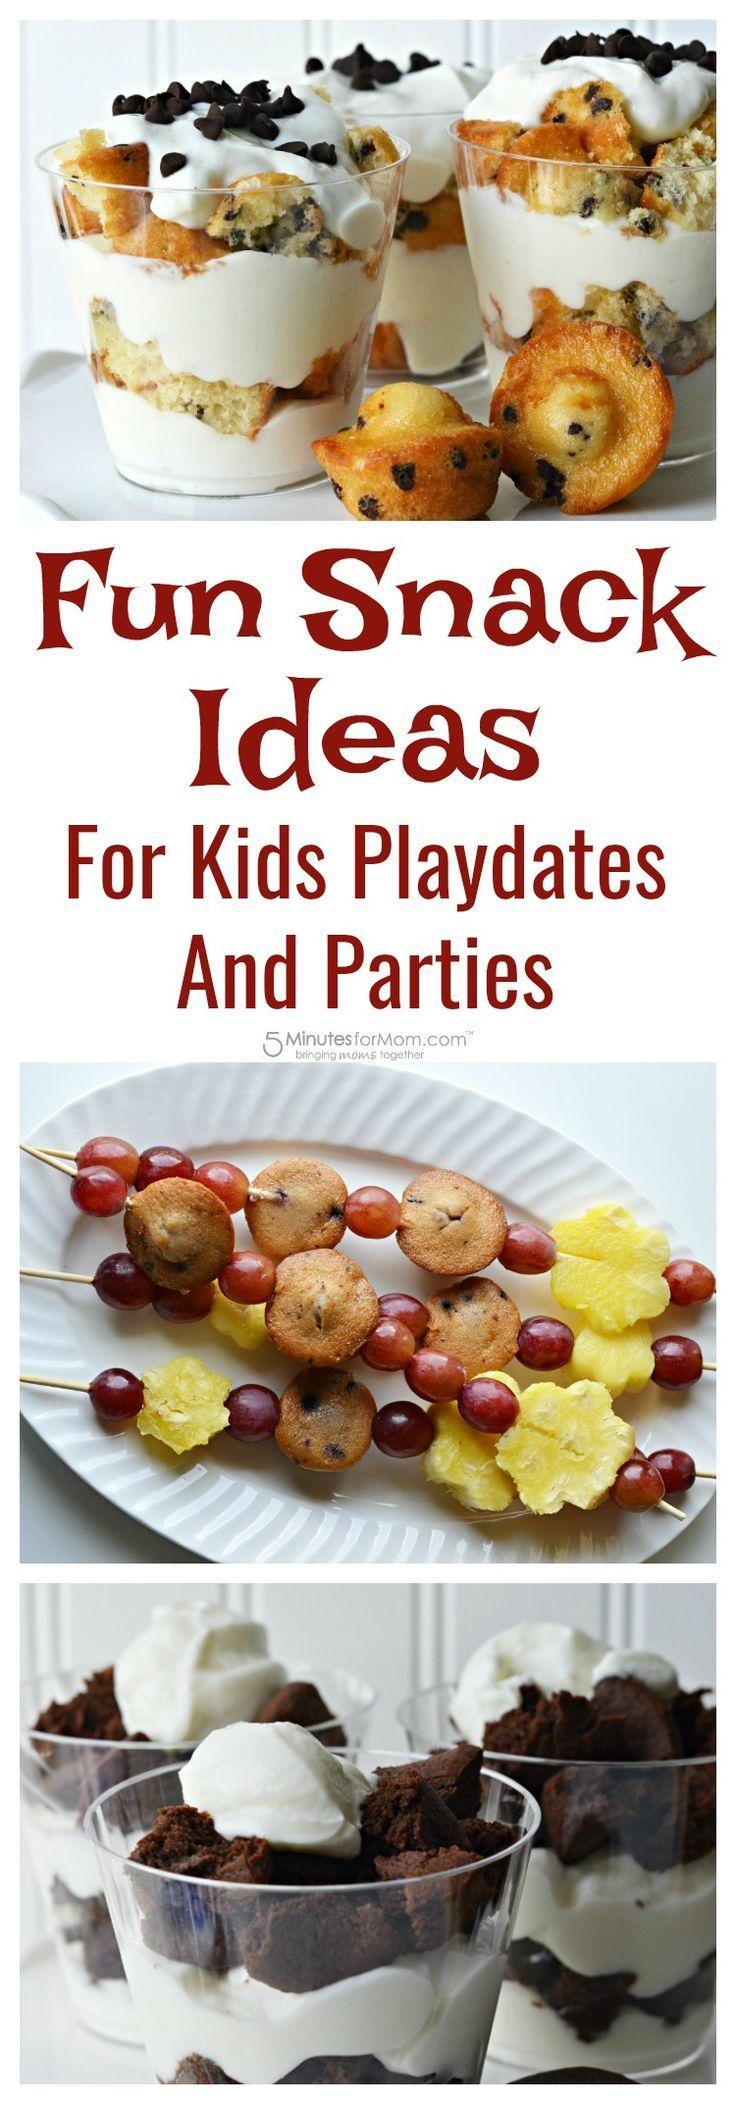 best 25 healthy birthday treats ideas on pinterest fun snacks for kids healthy kids birthday. Black Bedroom Furniture Sets. Home Design Ideas